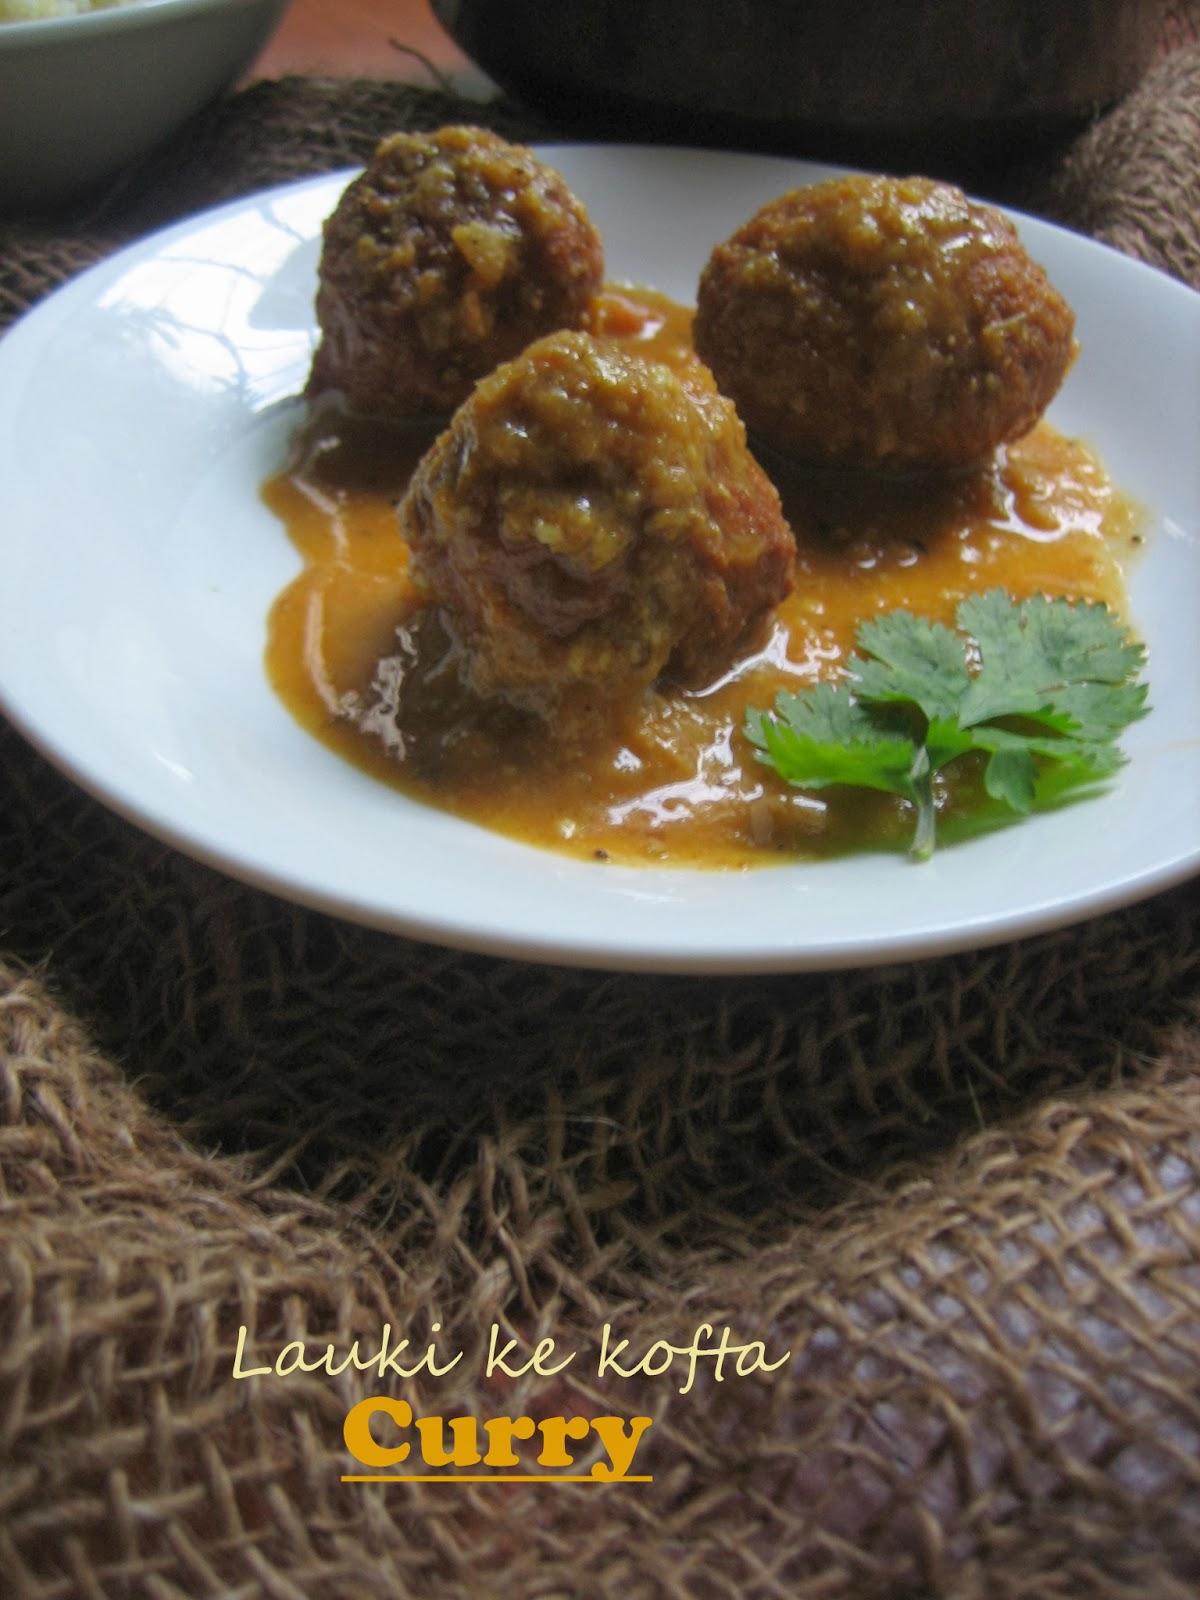 lauki/ bottle gourd kofta curry 1